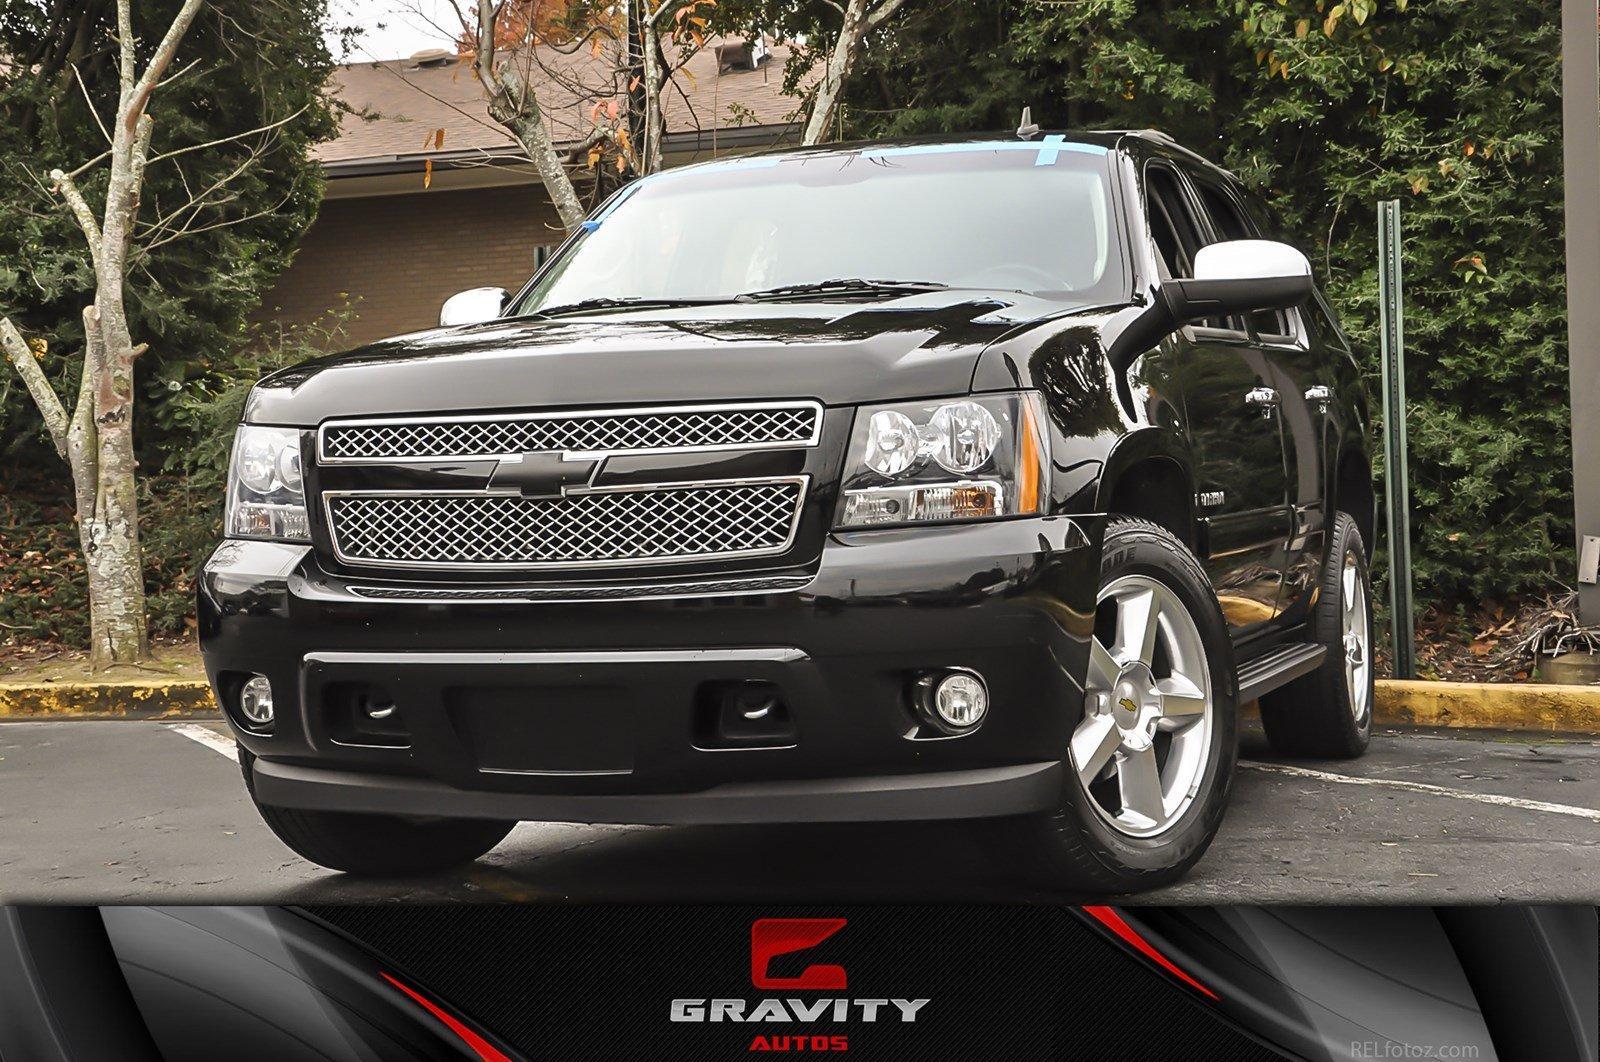 2014 Chevrolet Tahoe Tahoe Ls Stock 109576 For Sale Near Chamblee Ga Ga Chevrolet Dealer